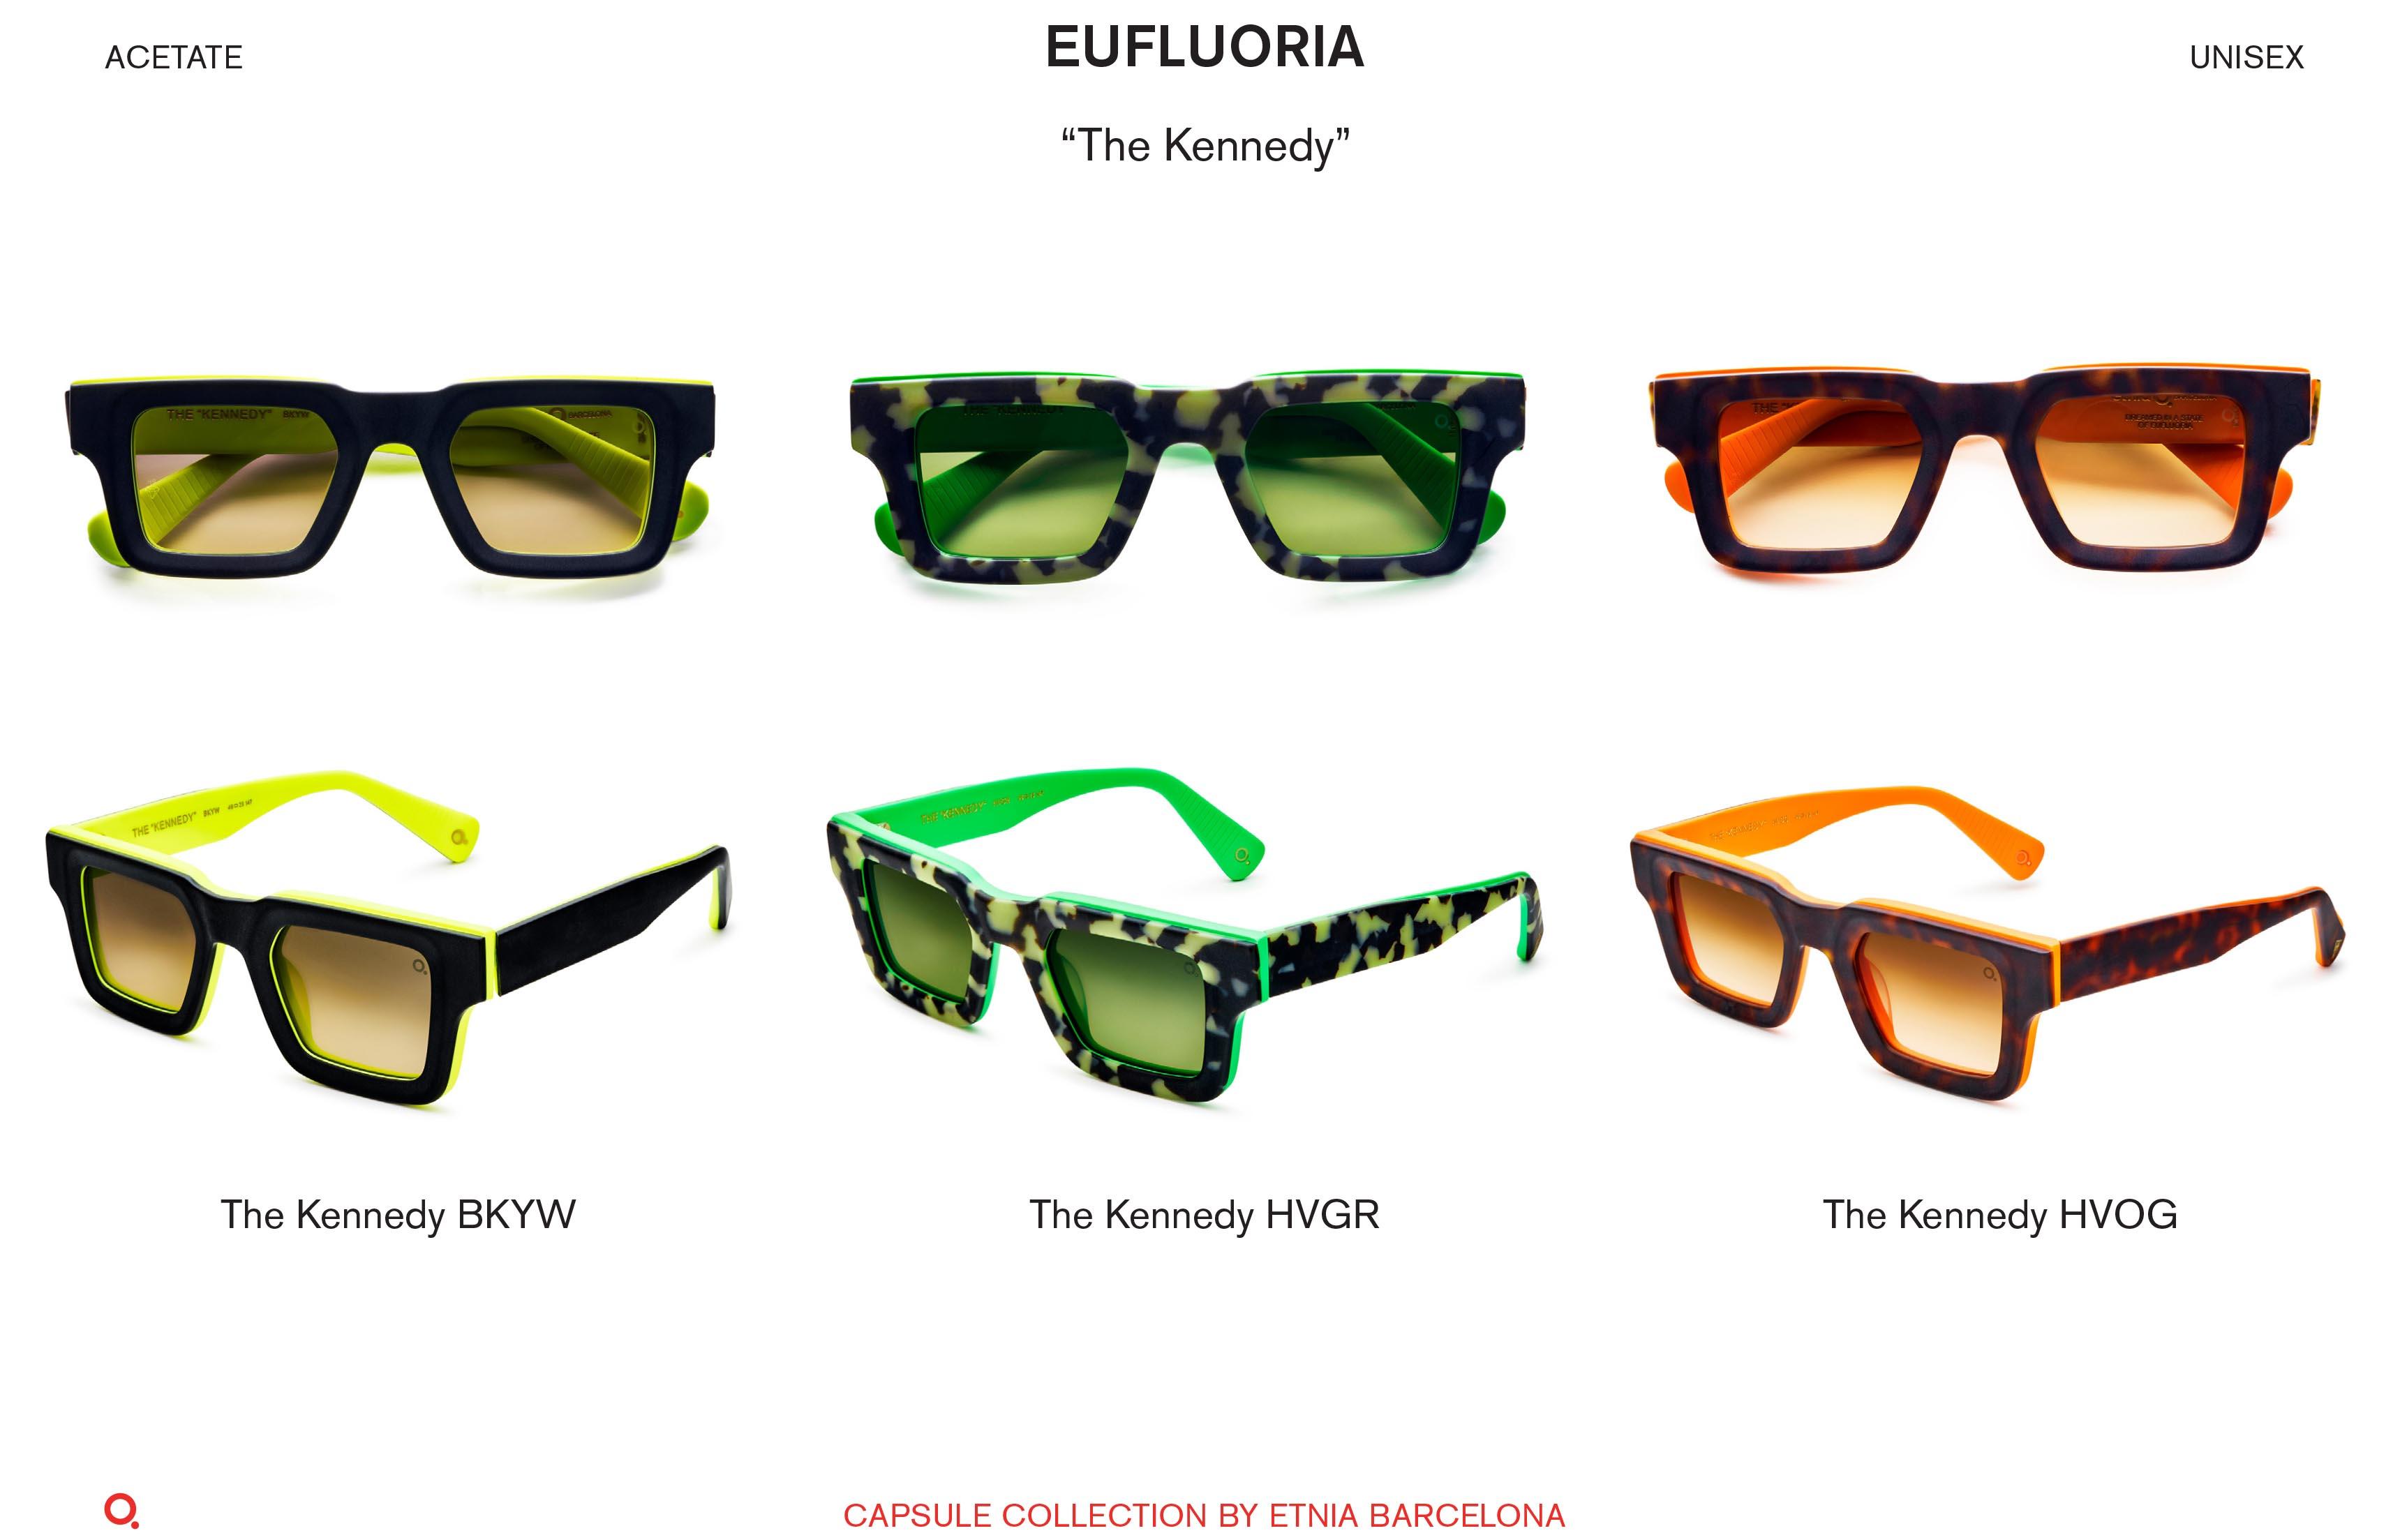 ETNIA BARCELONA Capsule Collection – Eufluoria